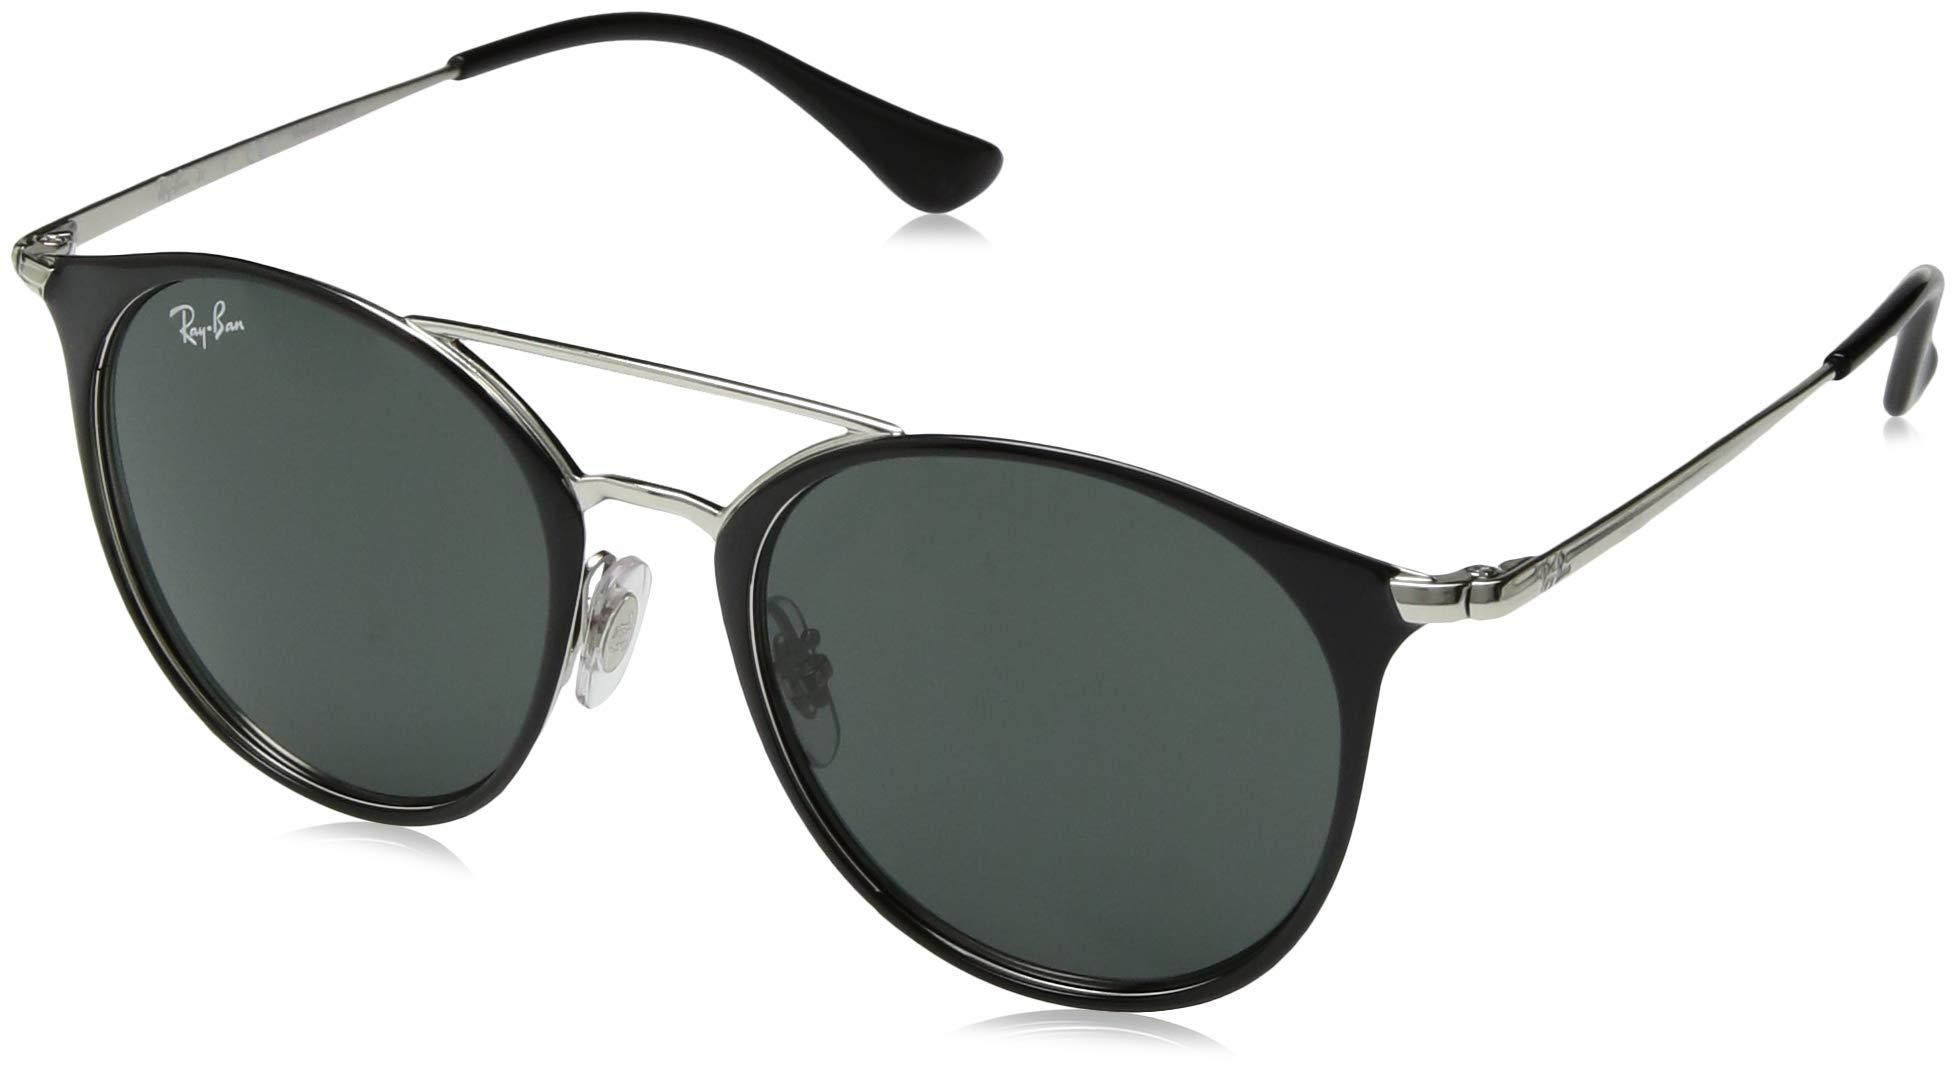 Ray-Ban Junior RJ9545S Round Kids Sunglasses, Black on Silver/Green, 47 mm